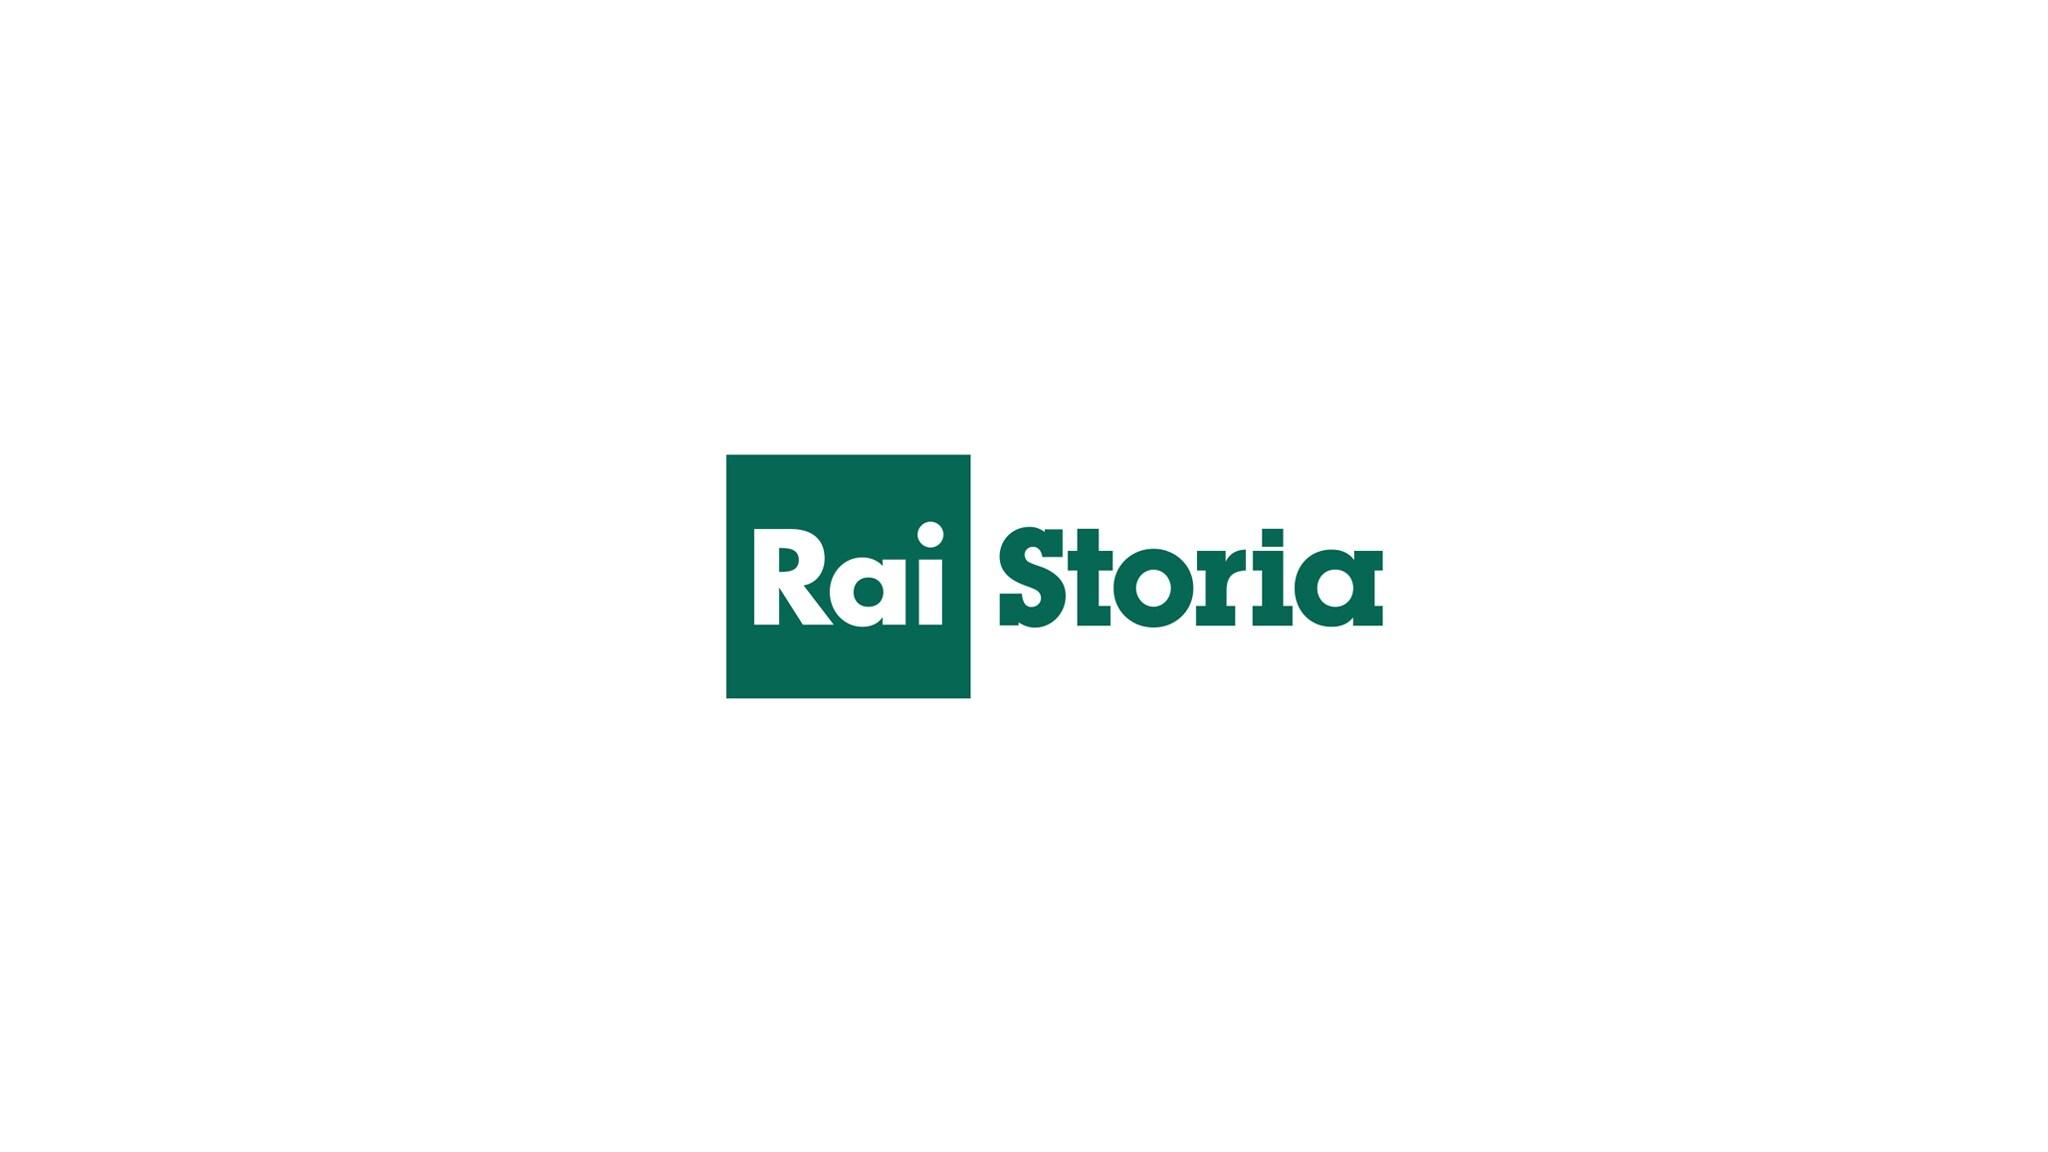 Rai Storia Ieri e Oggi p.62